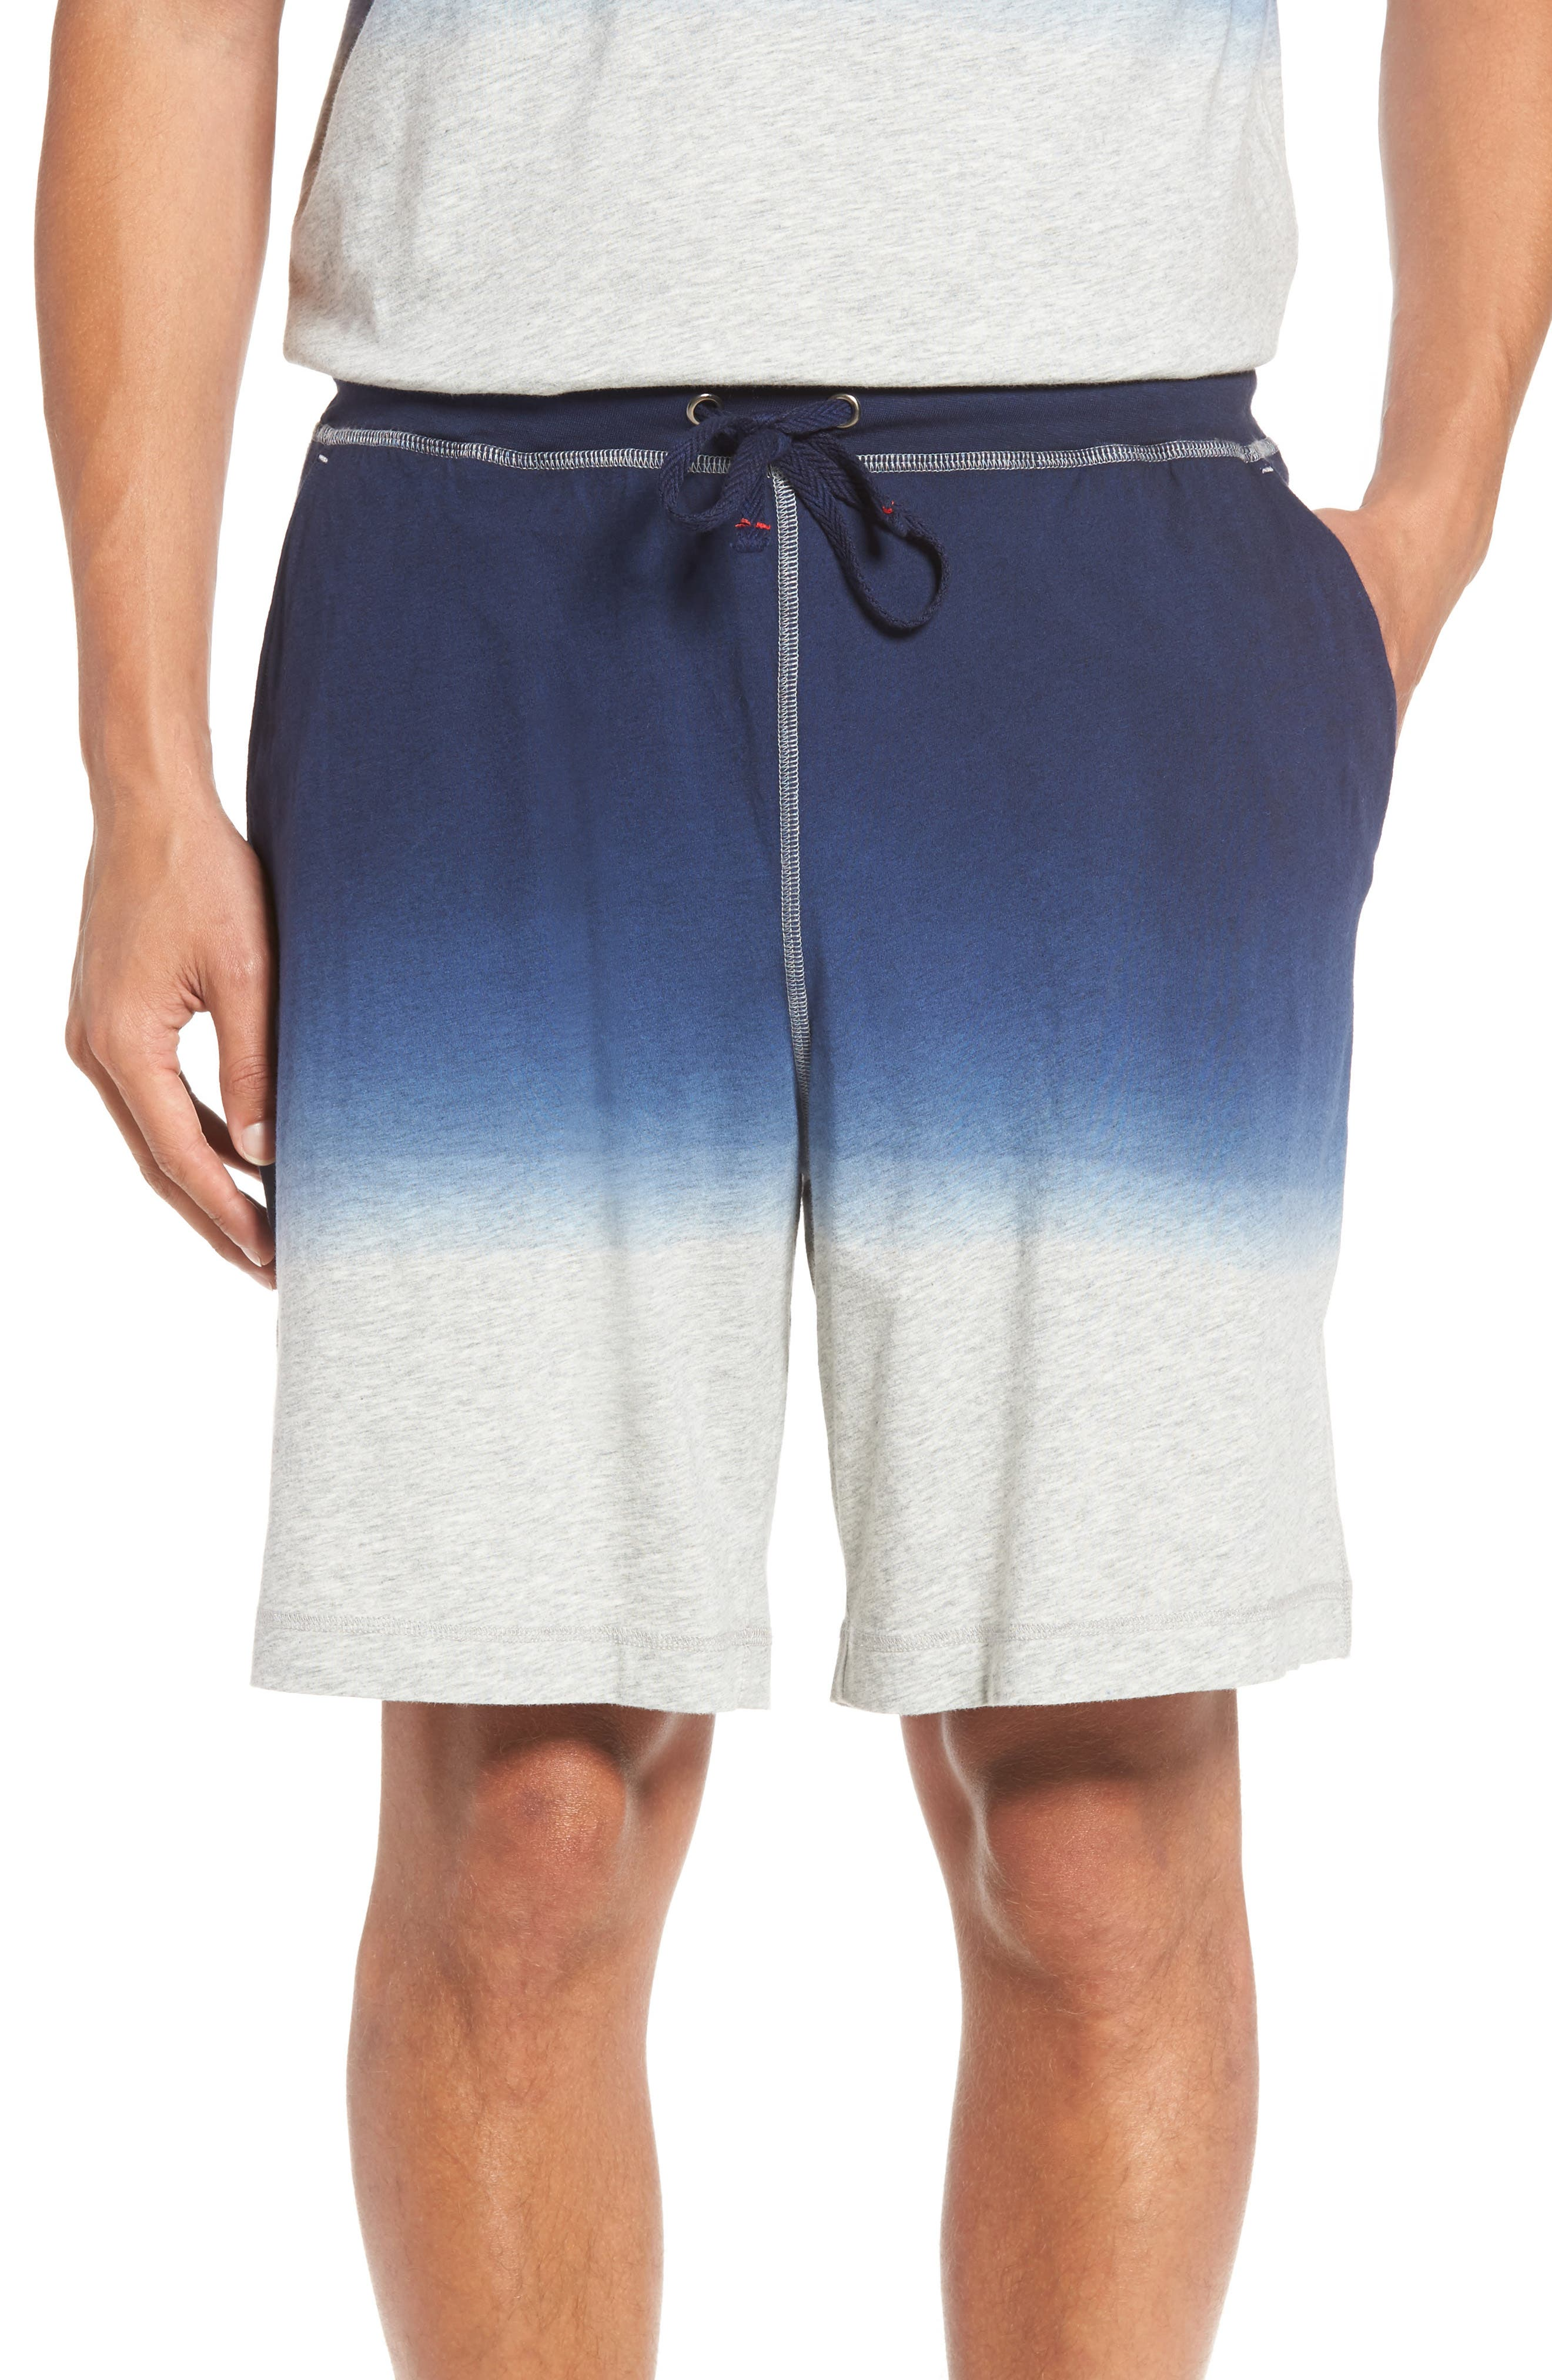 Alternate Image 1 Selected - Daniel Buchler Dip Dye Lounge Shorts